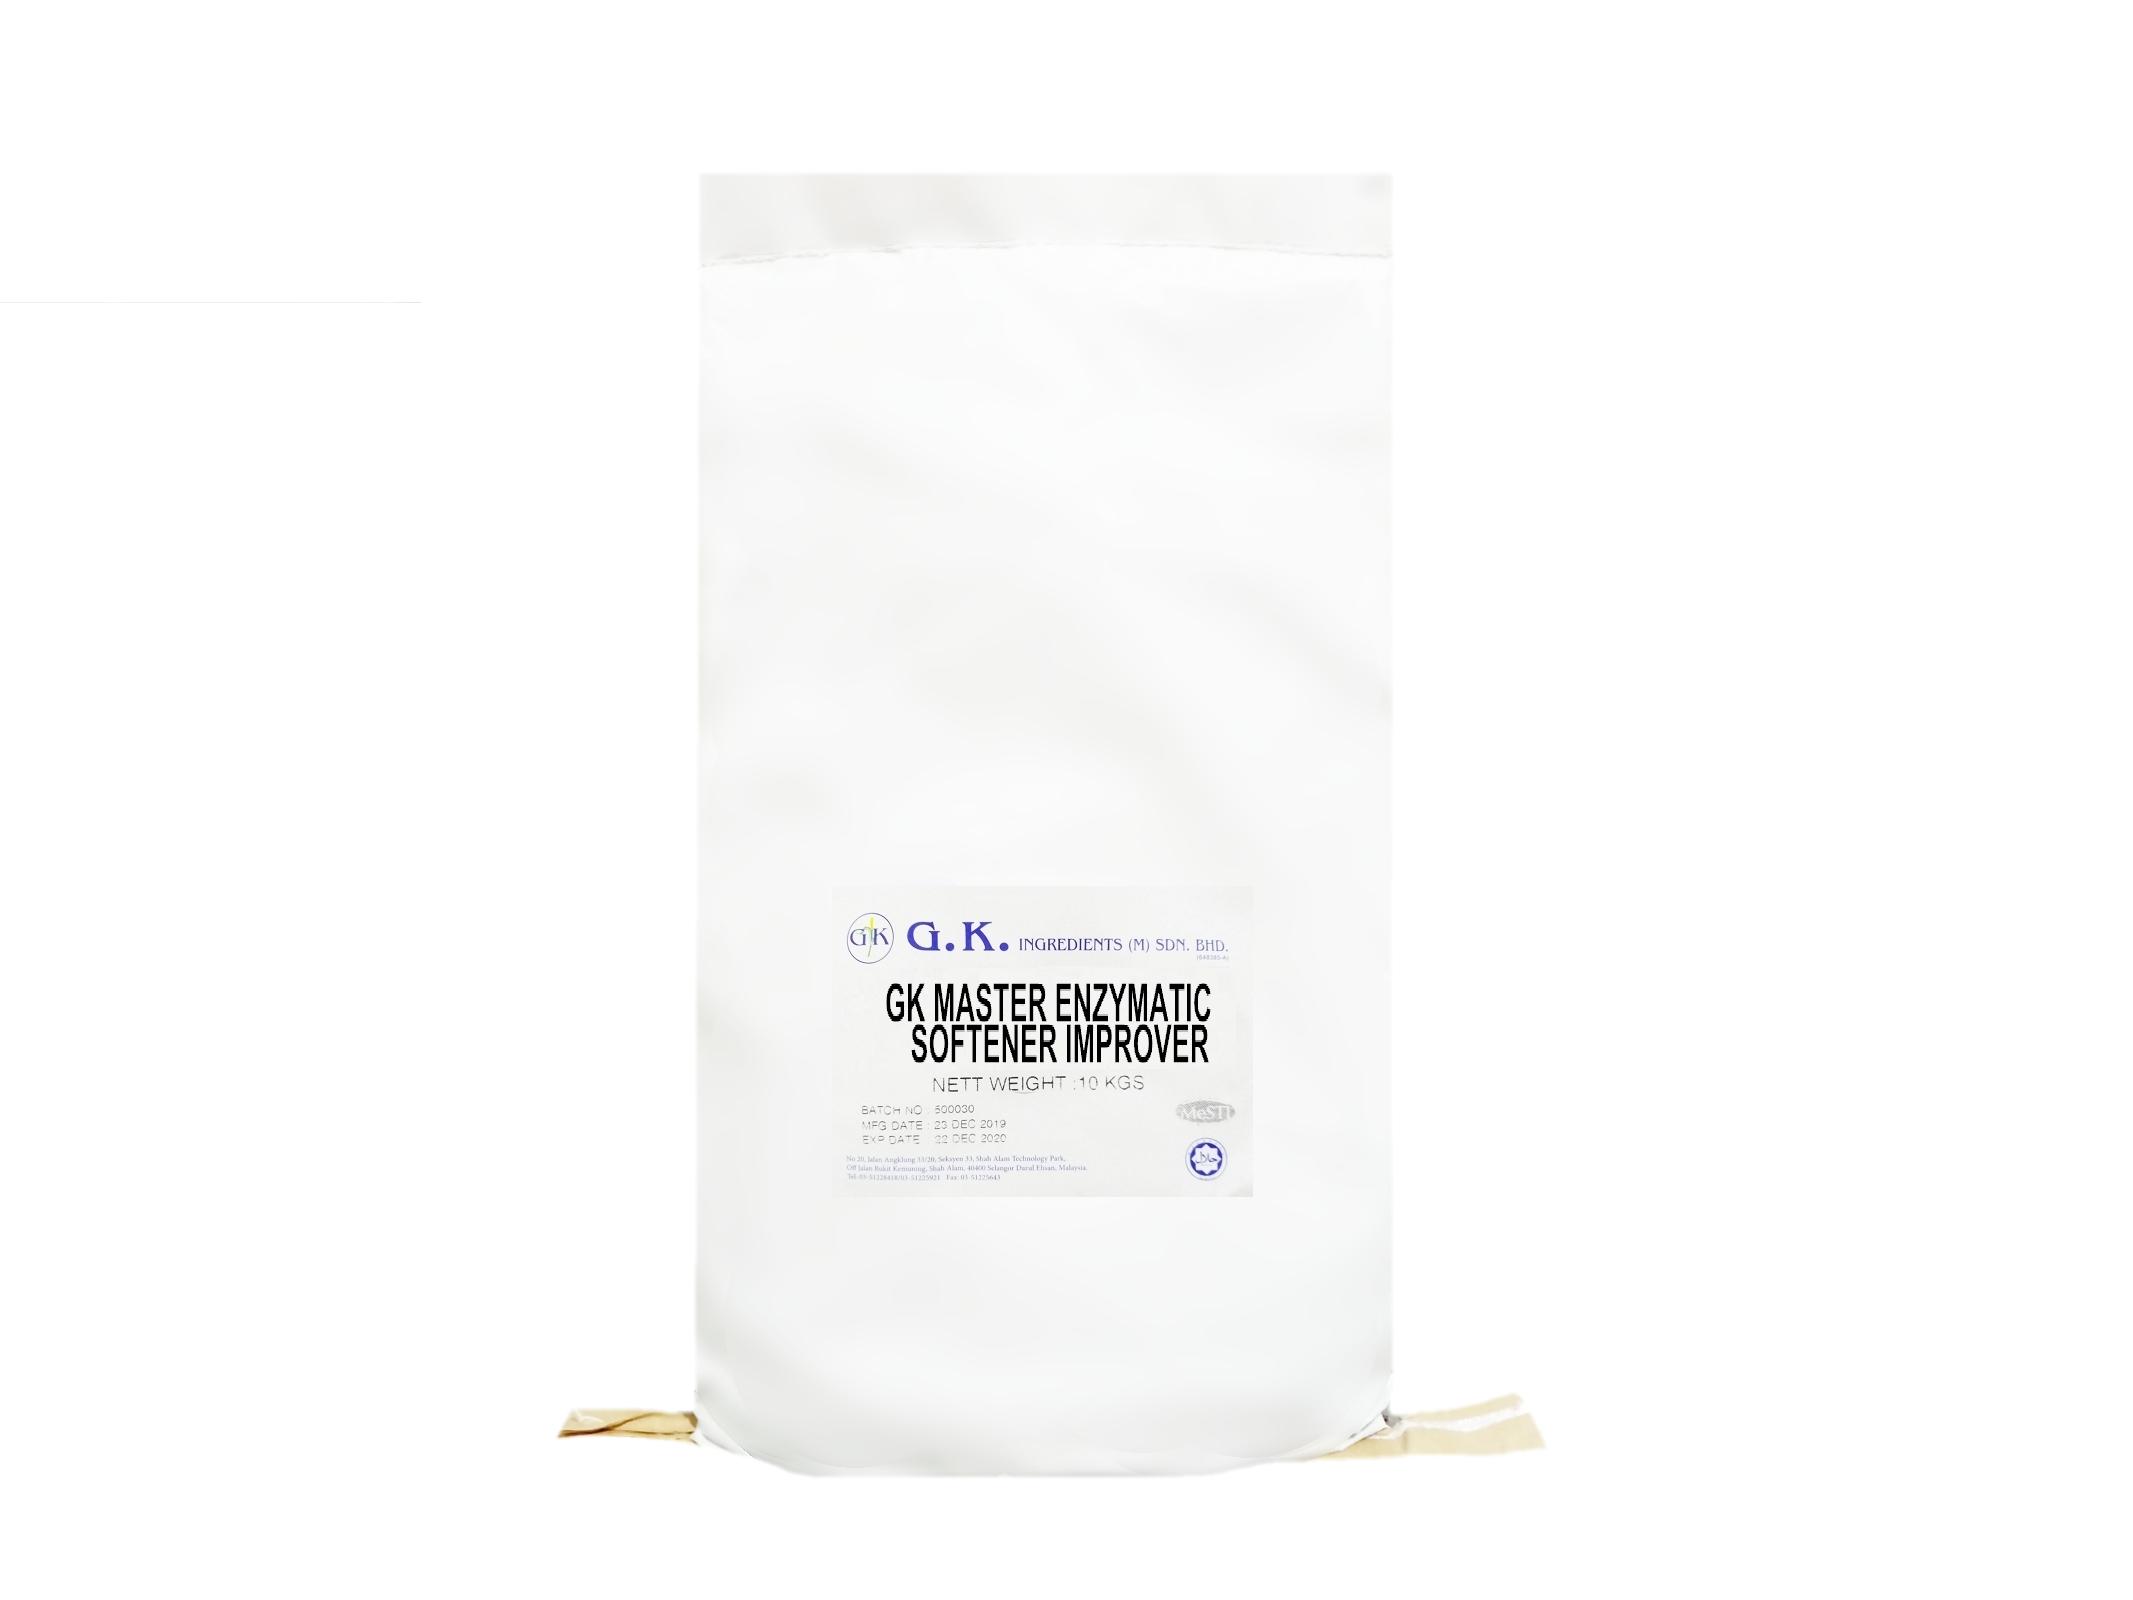 GK Master Enzymatic Softener Improver 10kg